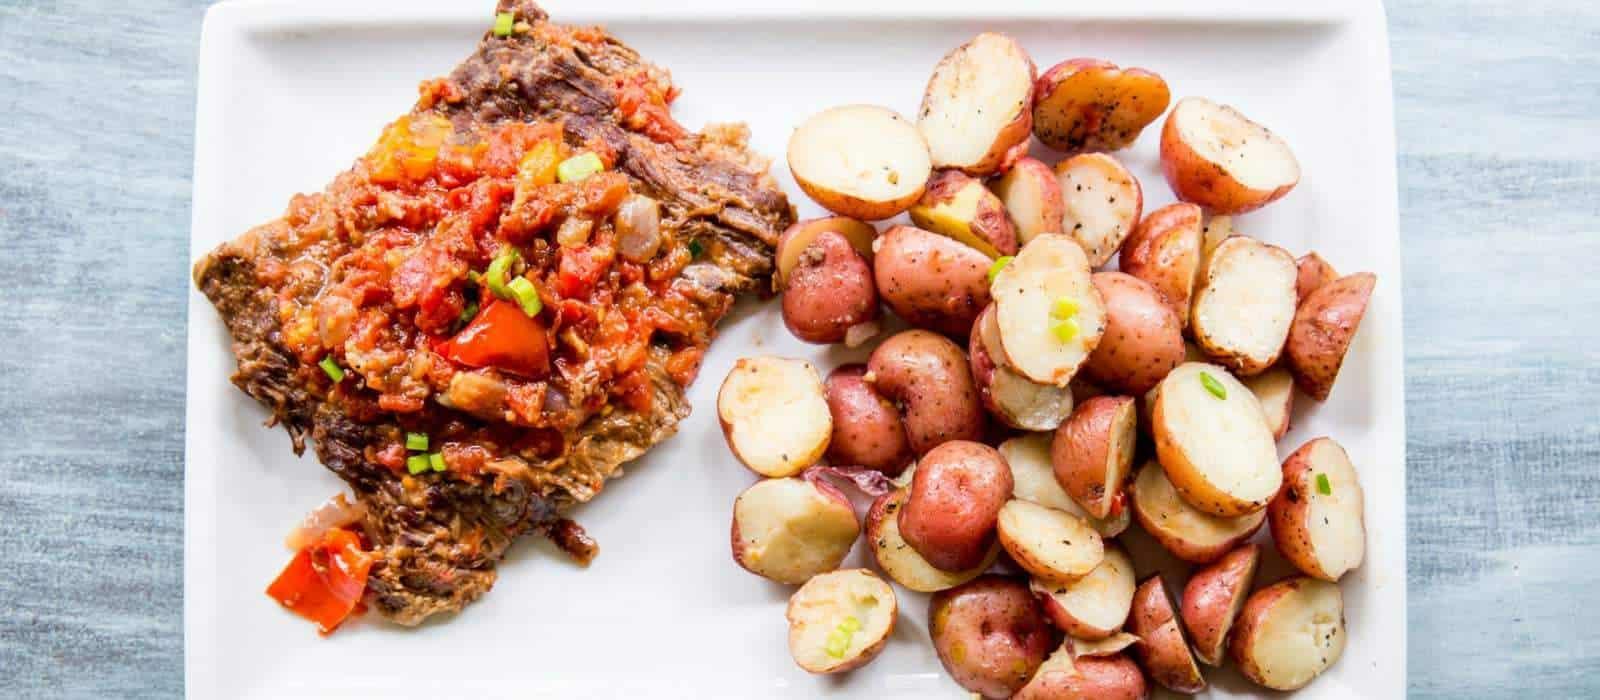 One-Pot Instant Pot Swiss Steak and Potatoes Recipe